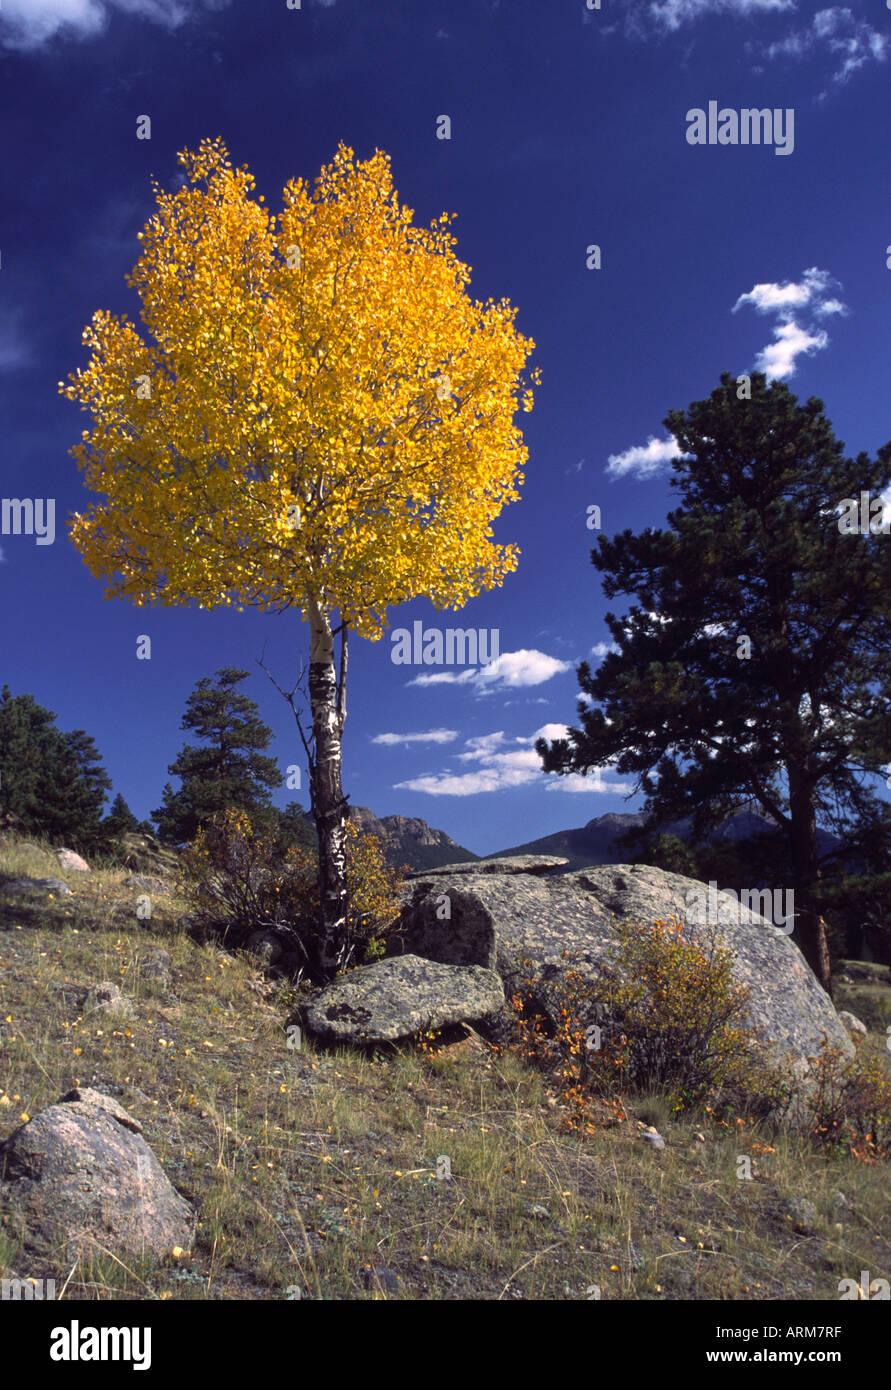 Single Aspen Tree In Autumn Color Rocky Mountain National Park Stock Photo Alamy